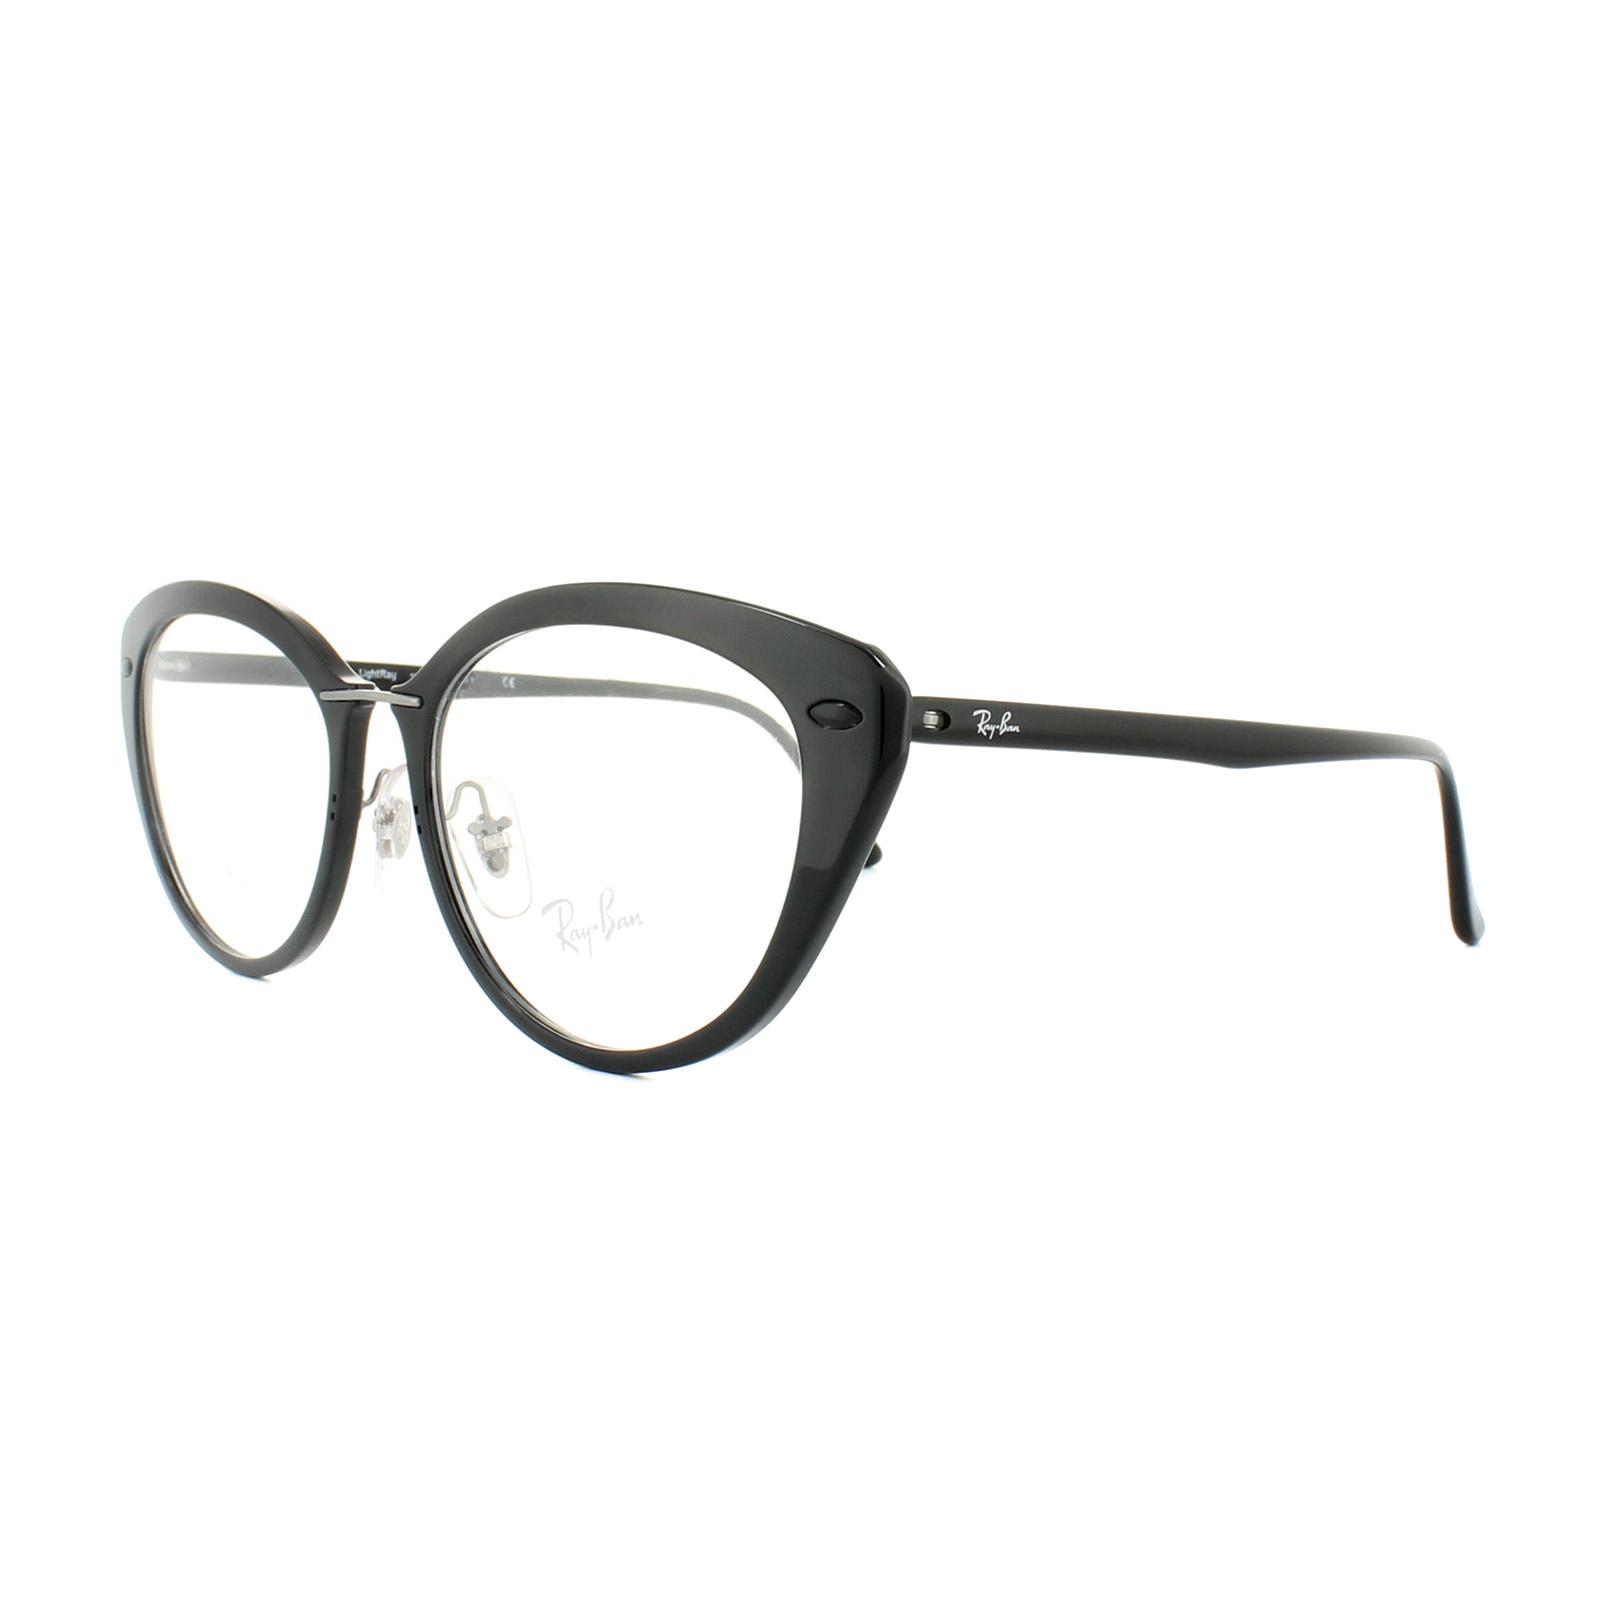 e9ac76f7ef Cheap Ray-Ban RX 7088 Glasses Frames - Discounted Sunglasses